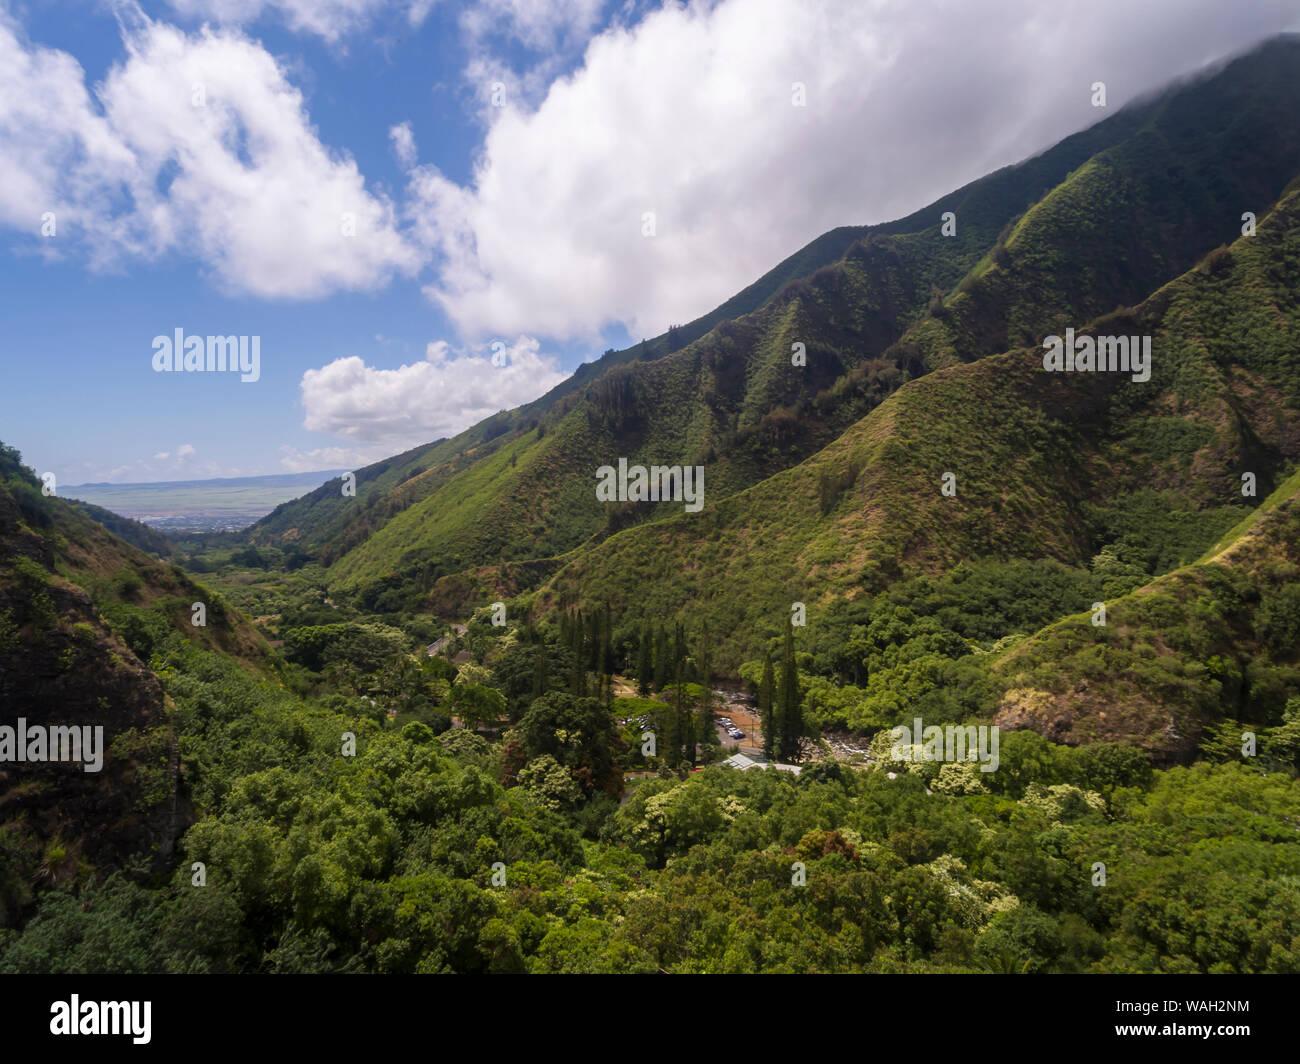 Luftaufnahme der Iao Valley State Park Maui Hawaii Stockfoto